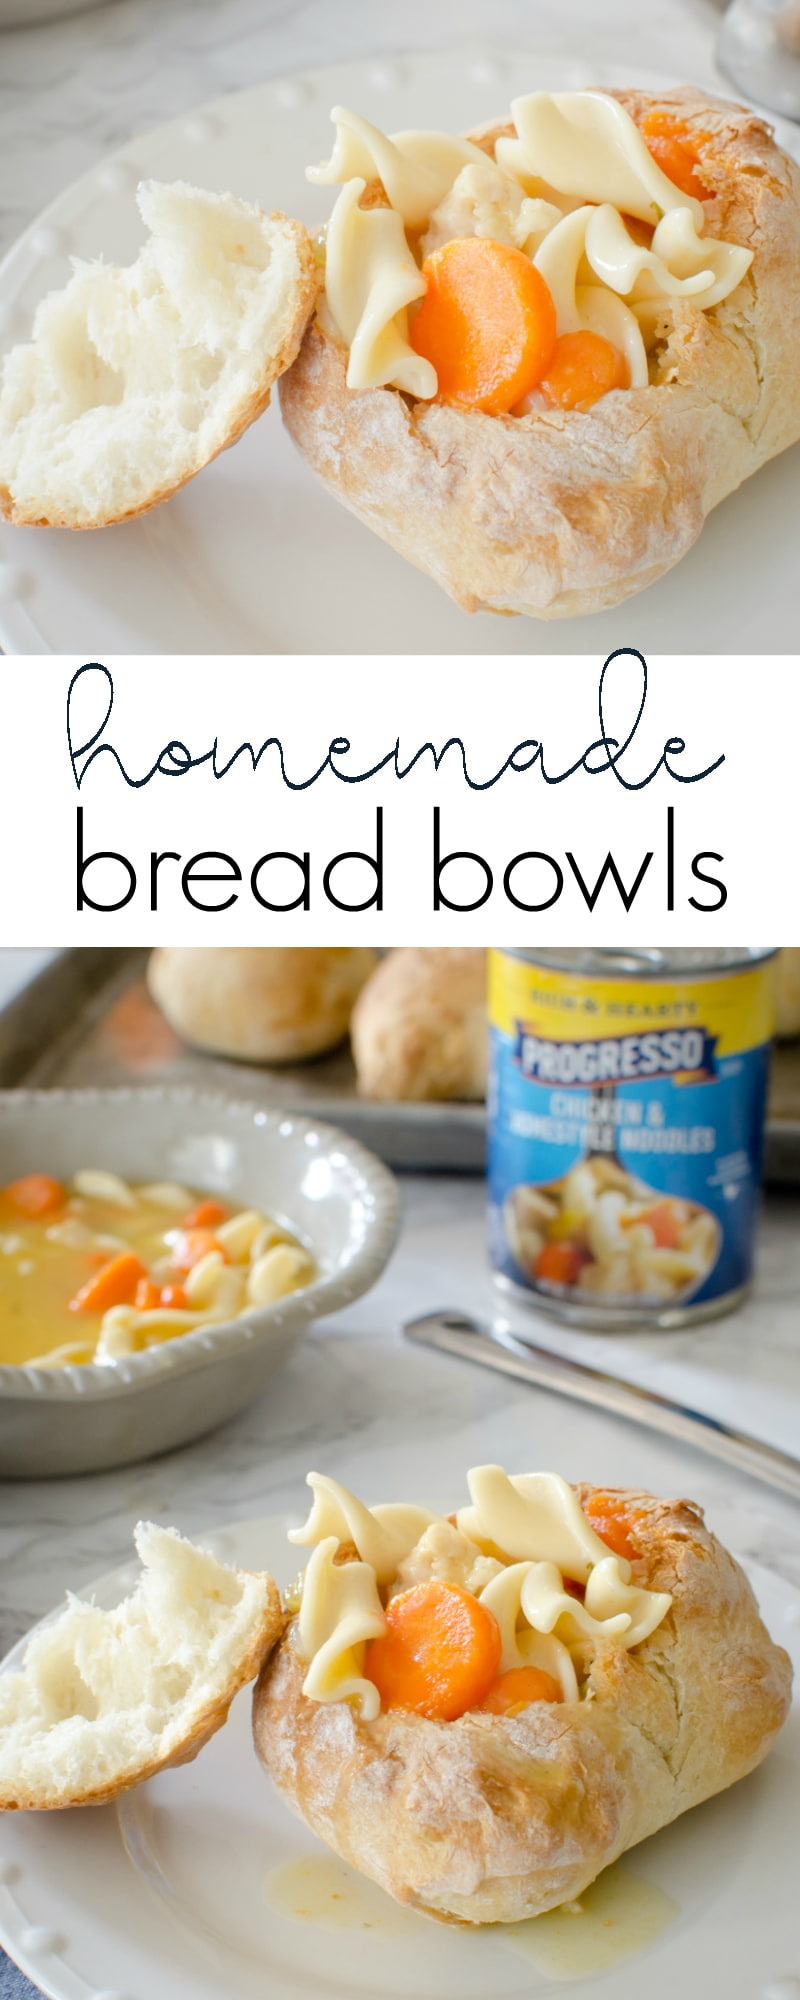 homemade-bread-bowls